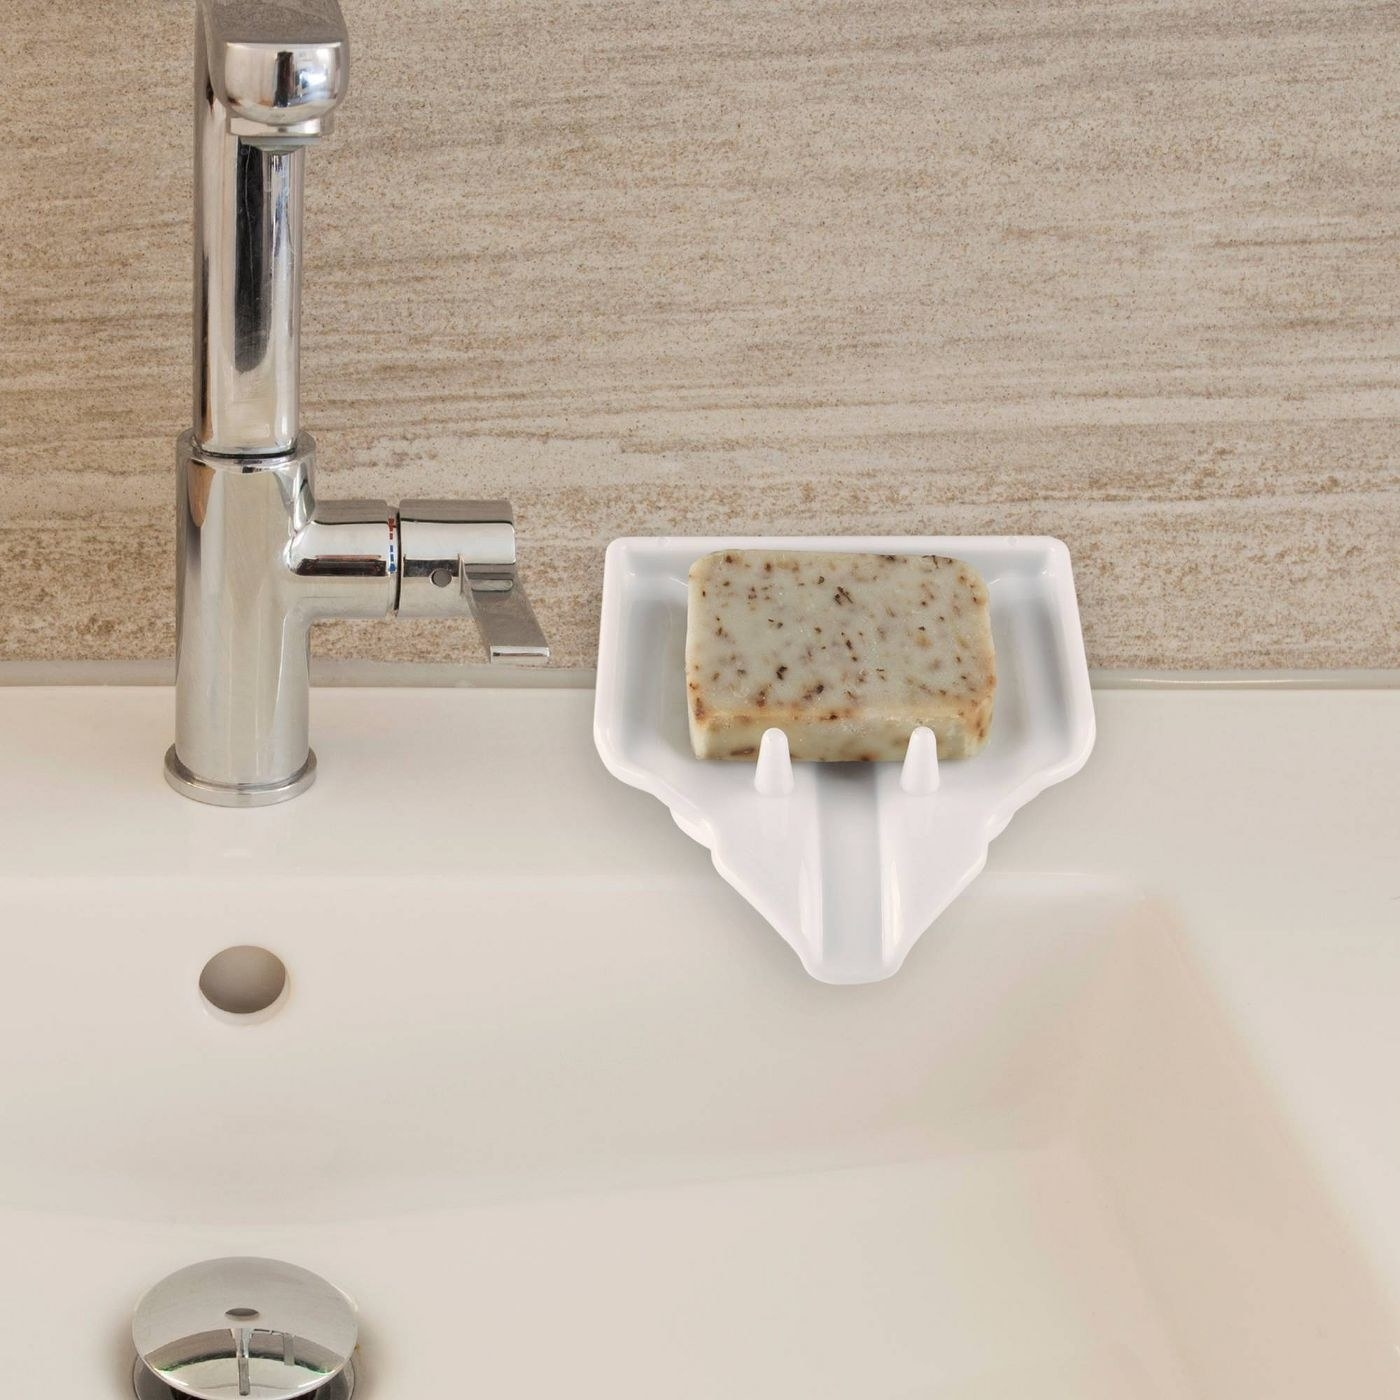 a waterfall soap dish